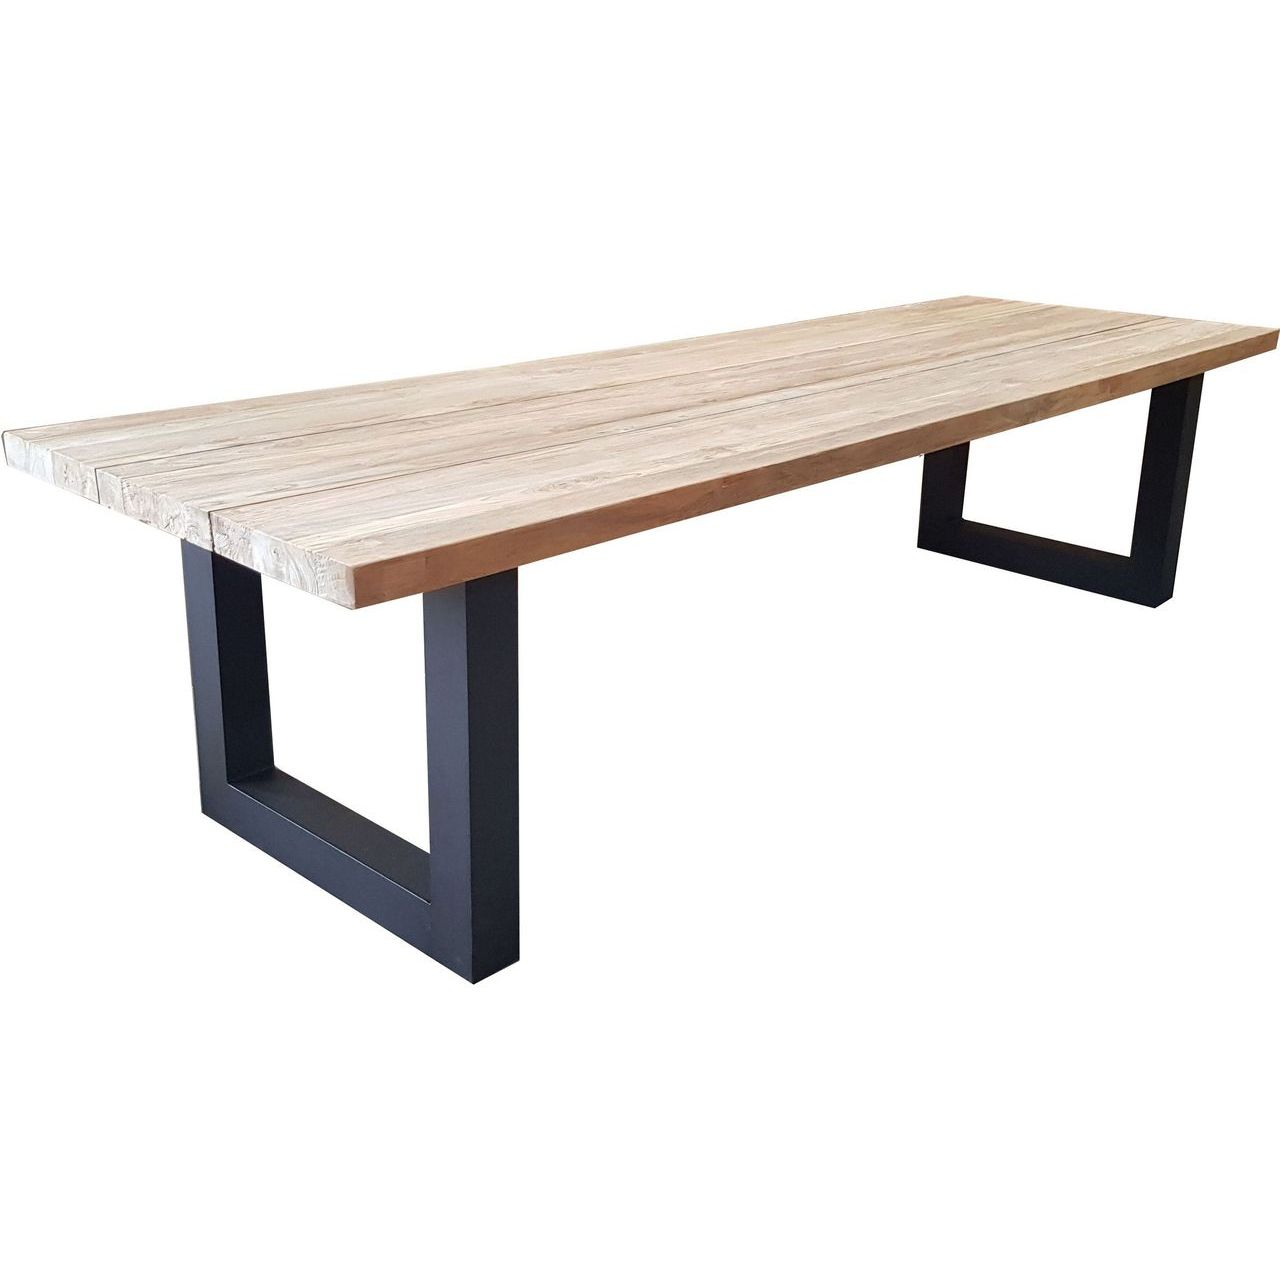 "Padma Outdoor Vittoria 98.5"" Reclaimed Teak Dining Table"